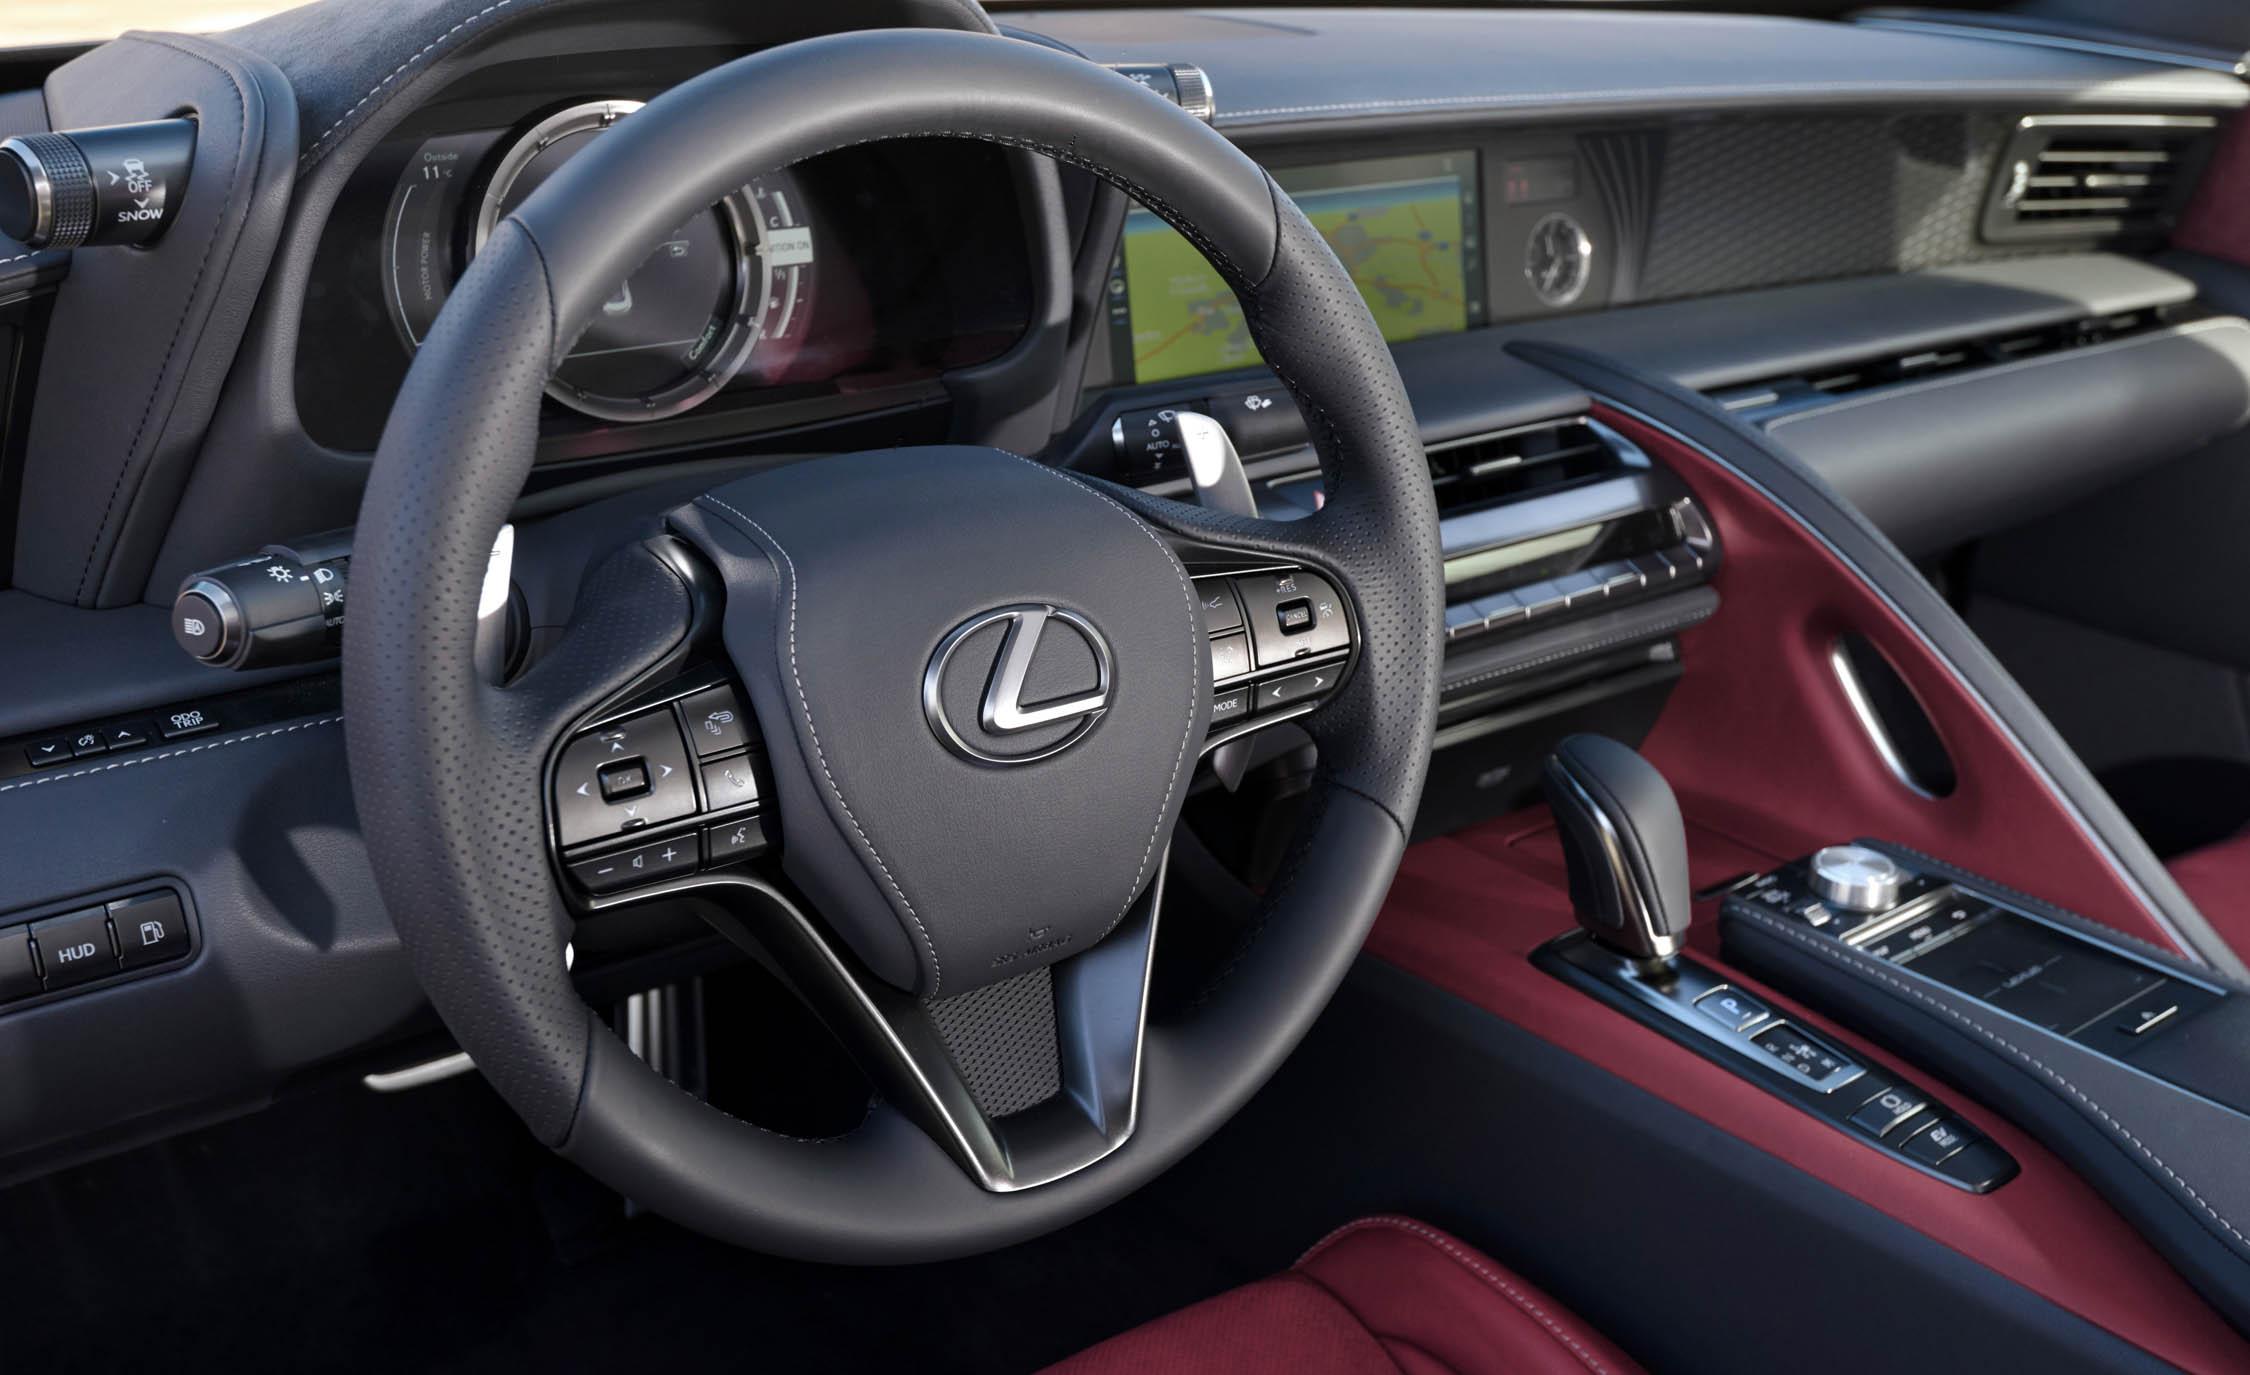 2018 Lexus Lc 500h Interior View Steering Wheel (Photo 56 of 84)